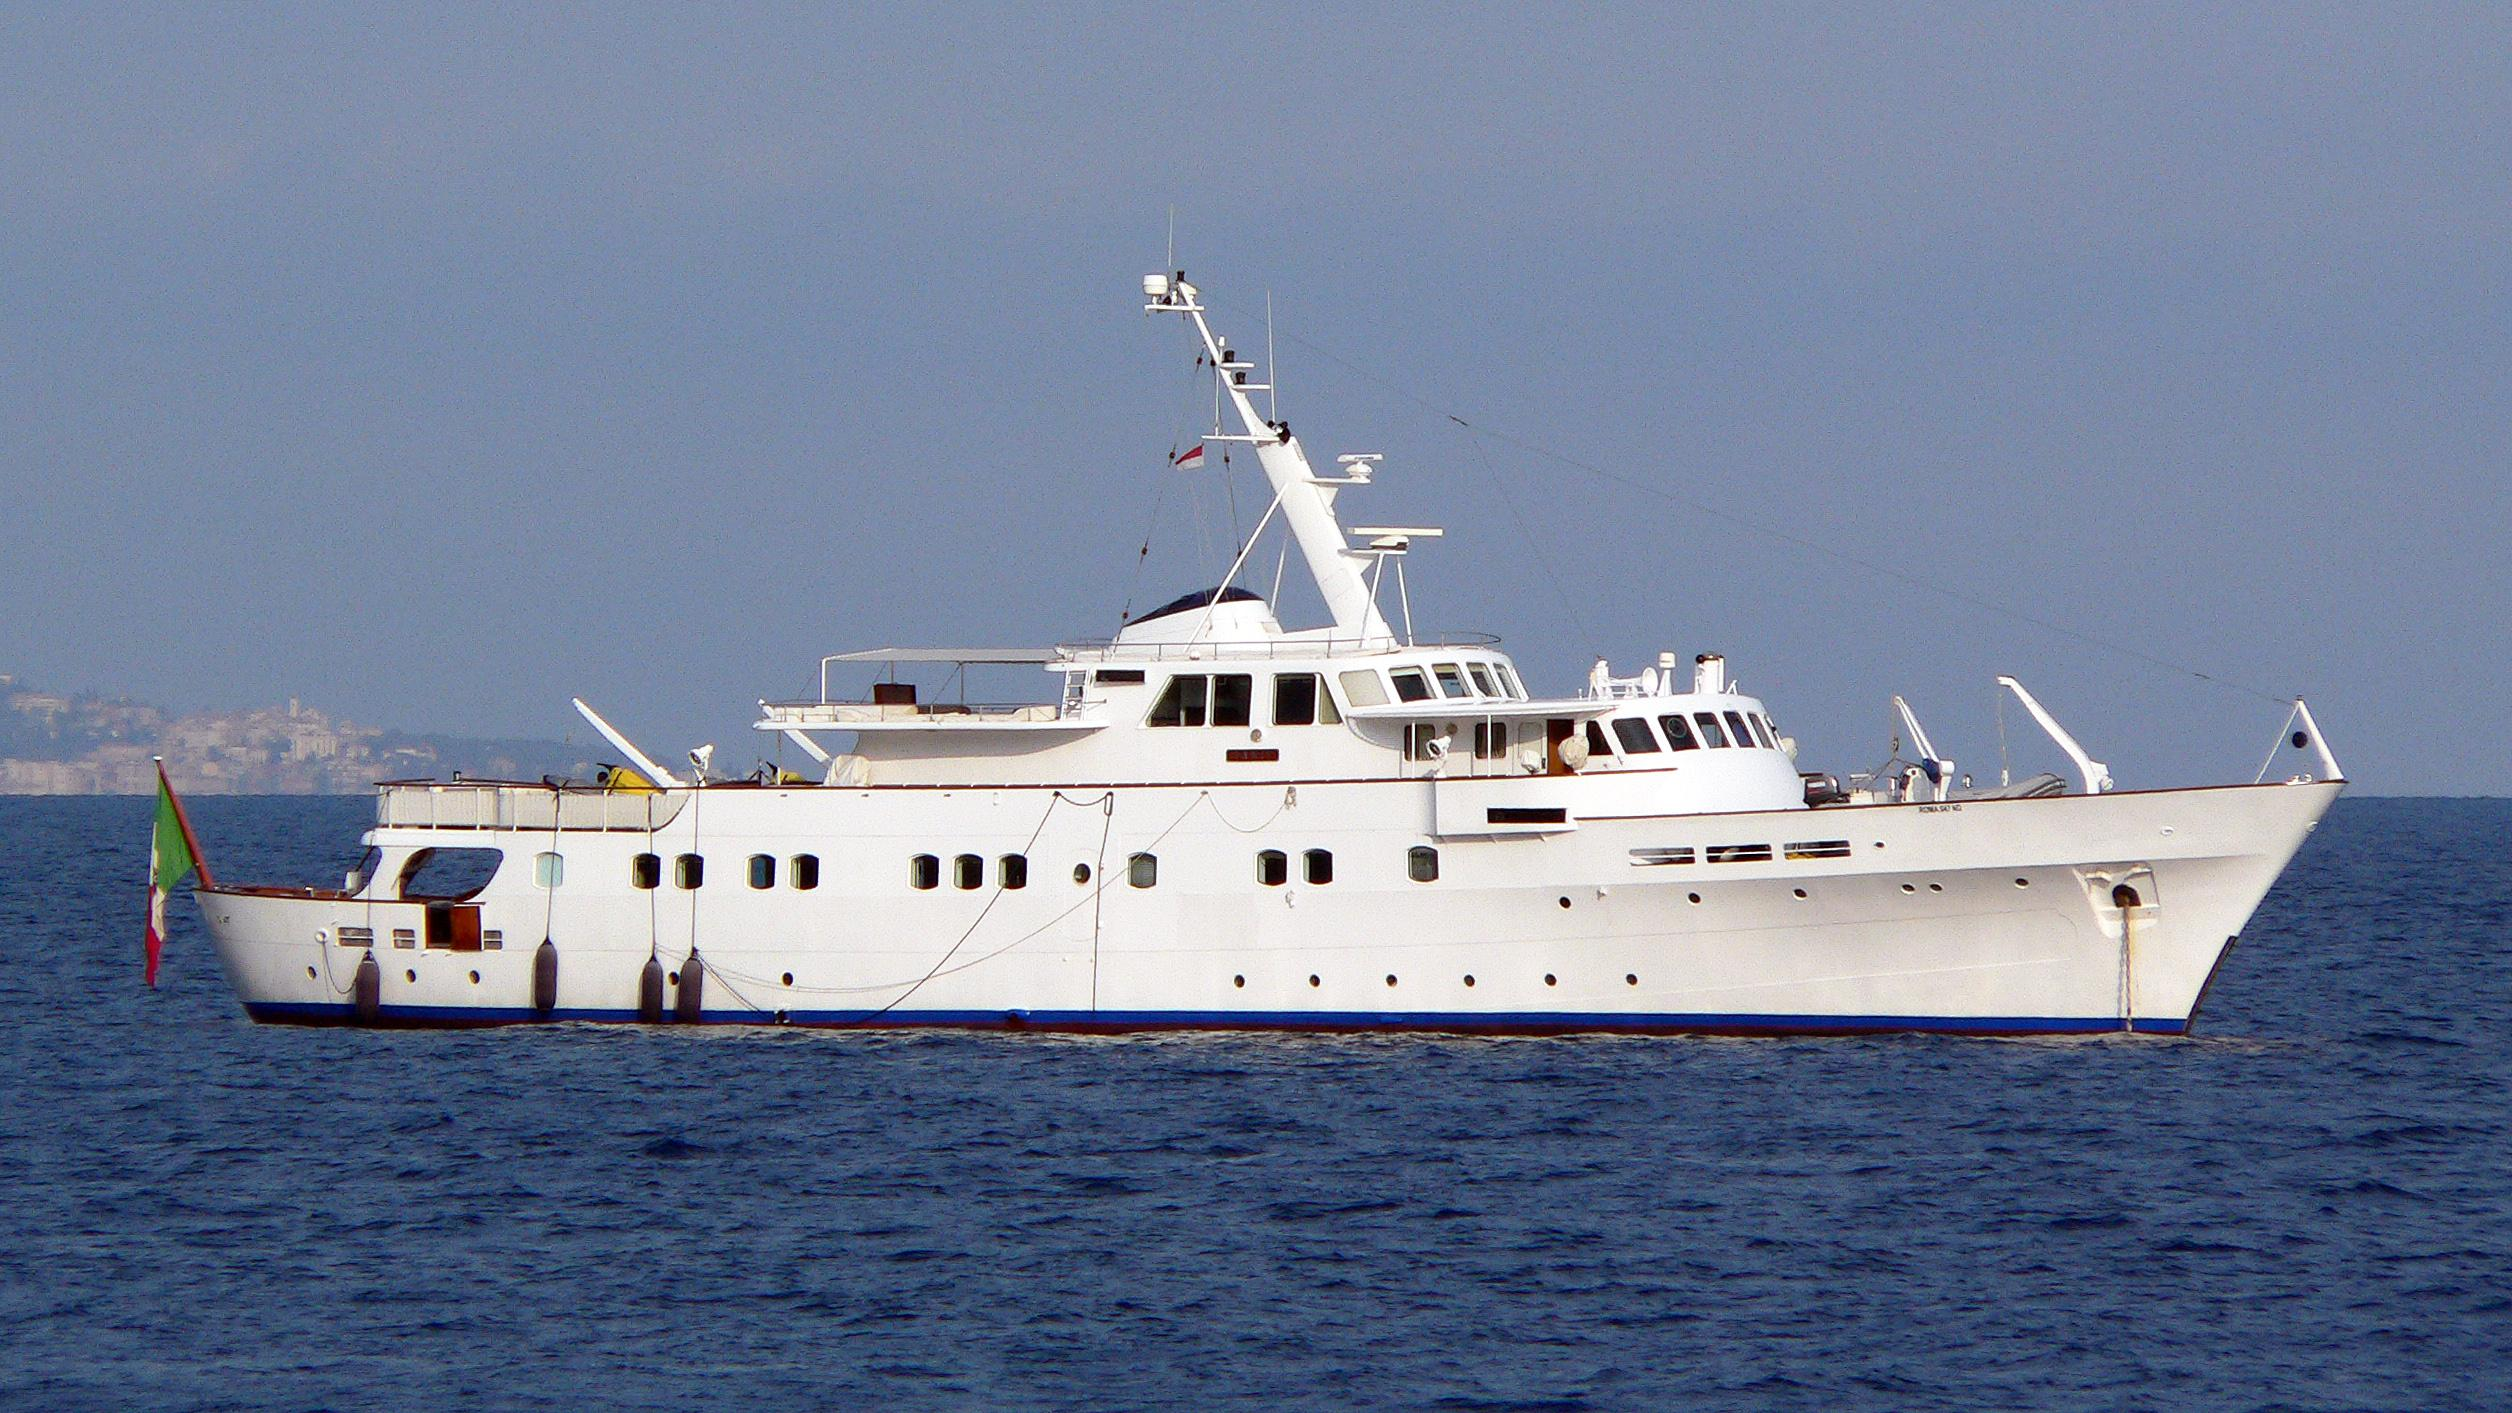 tanit-motor-yacht-camper-nicholsons-1967-46m-before-refit